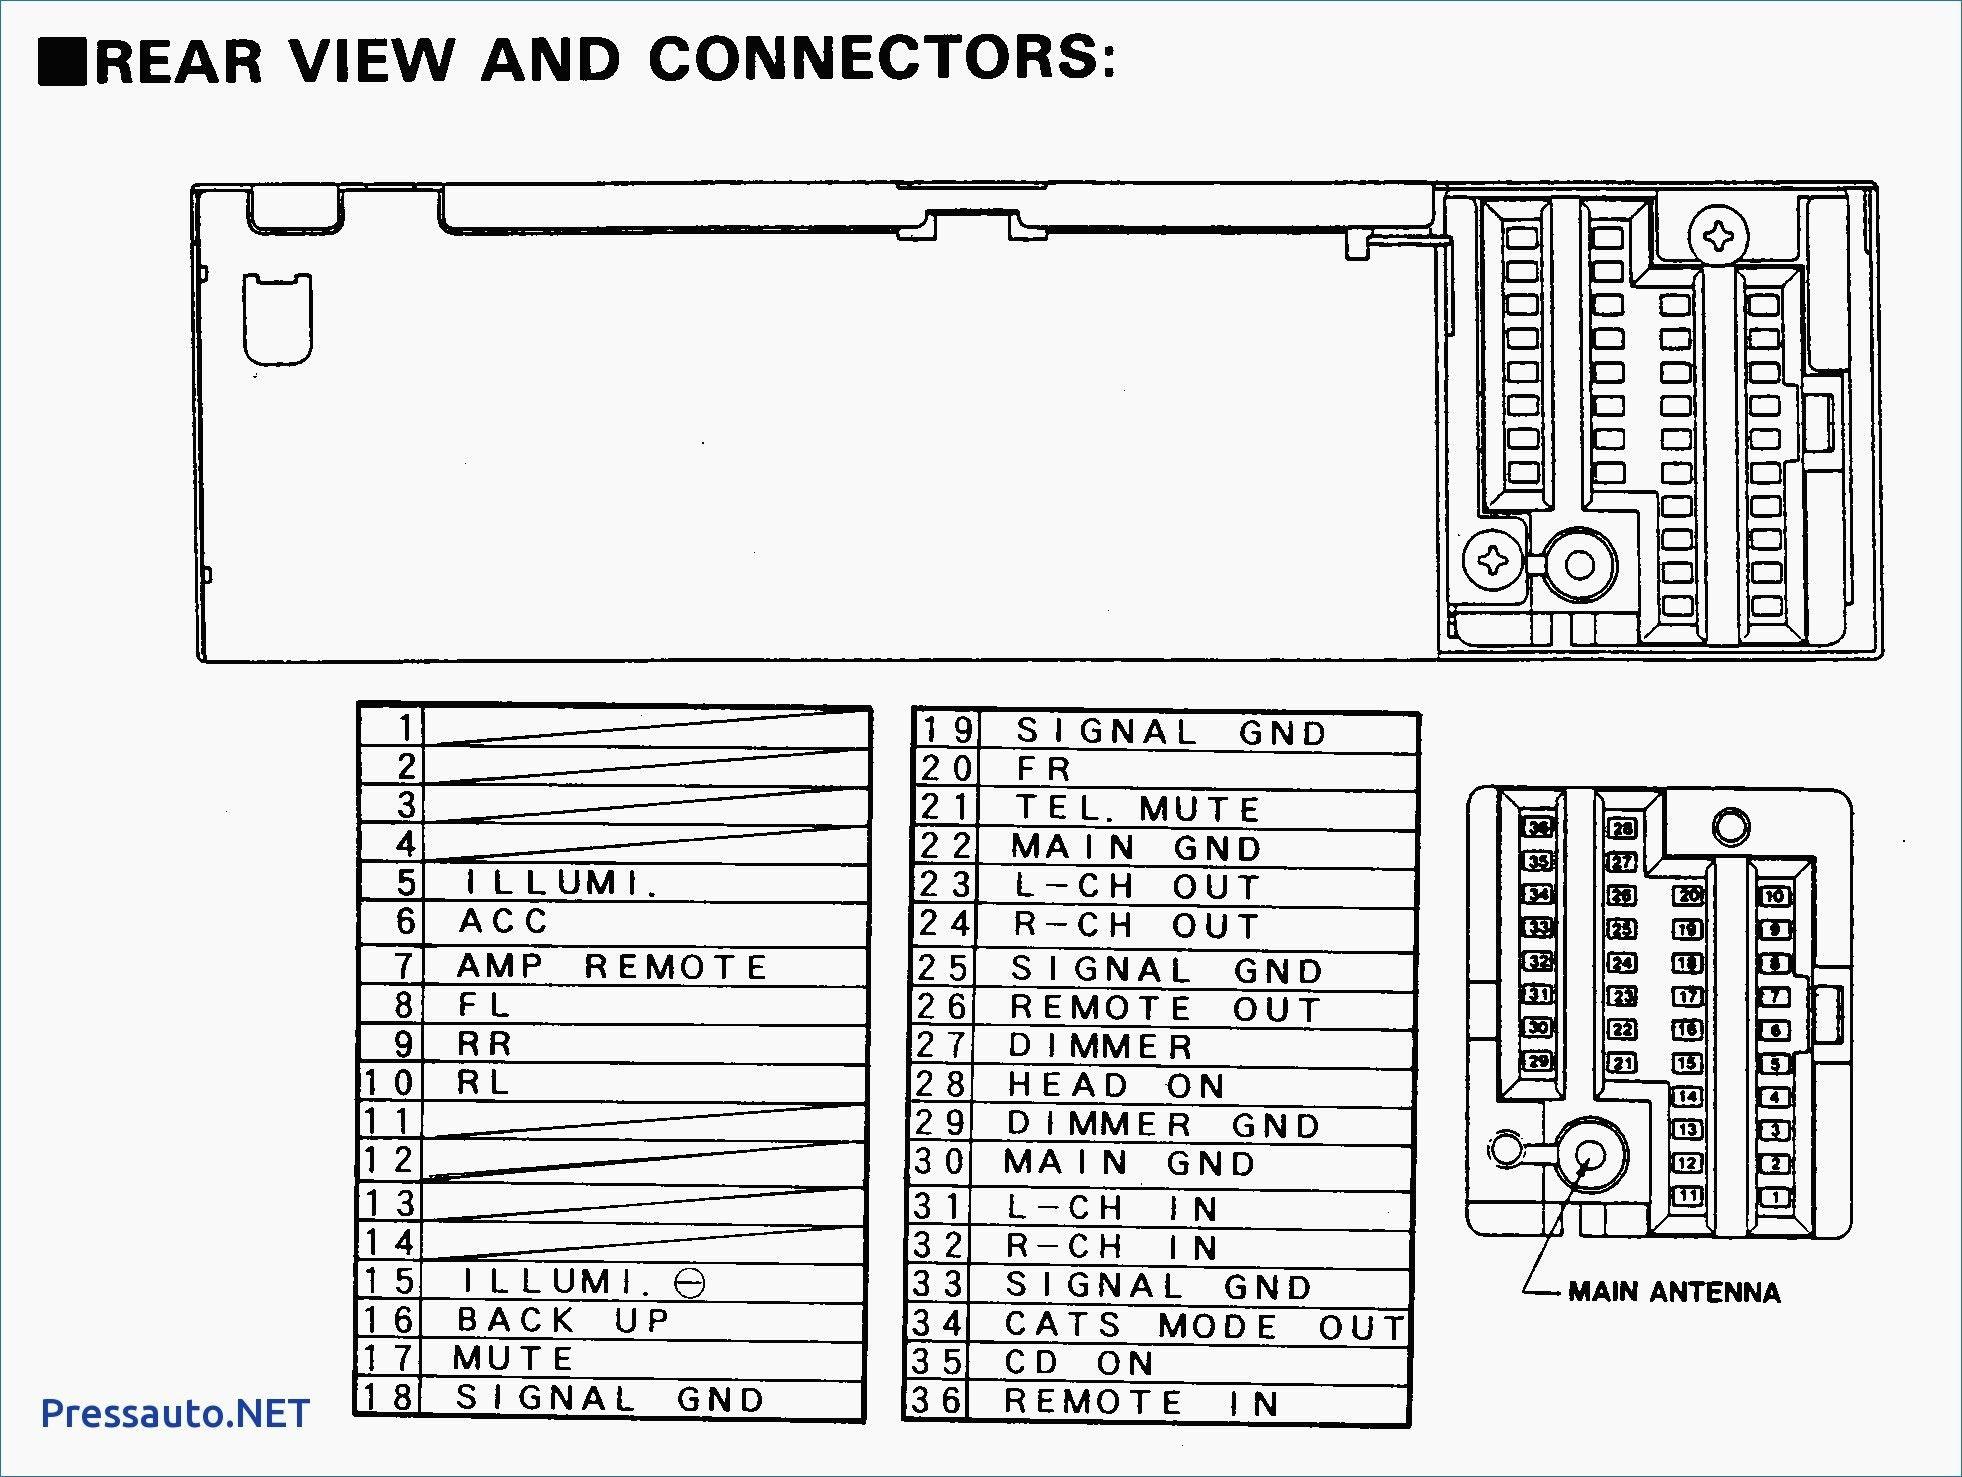 Car Radio Wiring Diagram New In 2020 Car Stereo Diagram Diagram Design